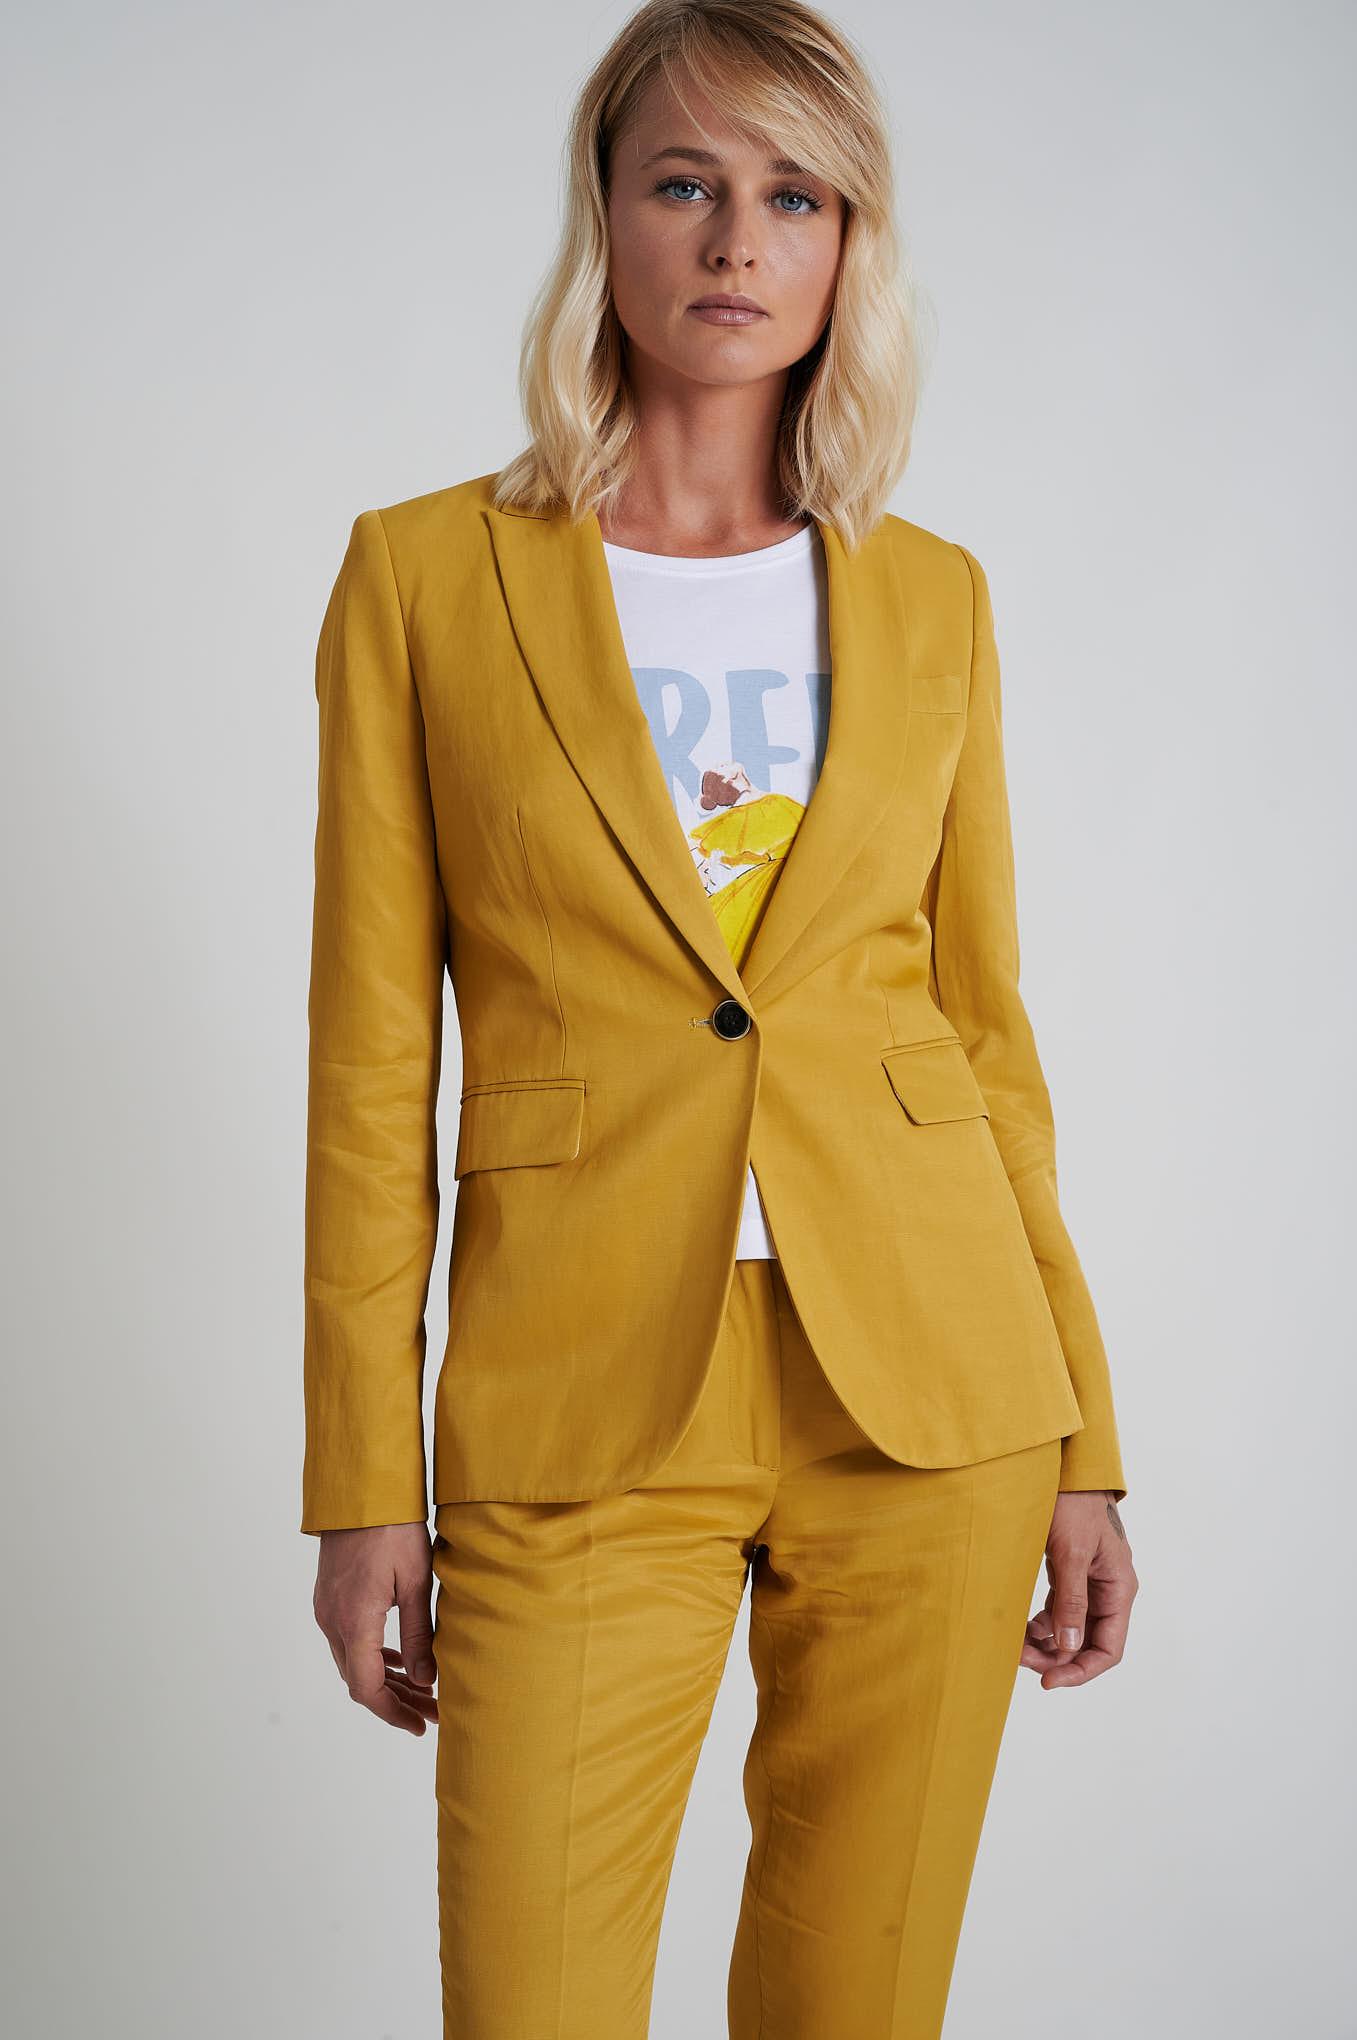 Blazer Amarelo Formal Mulher